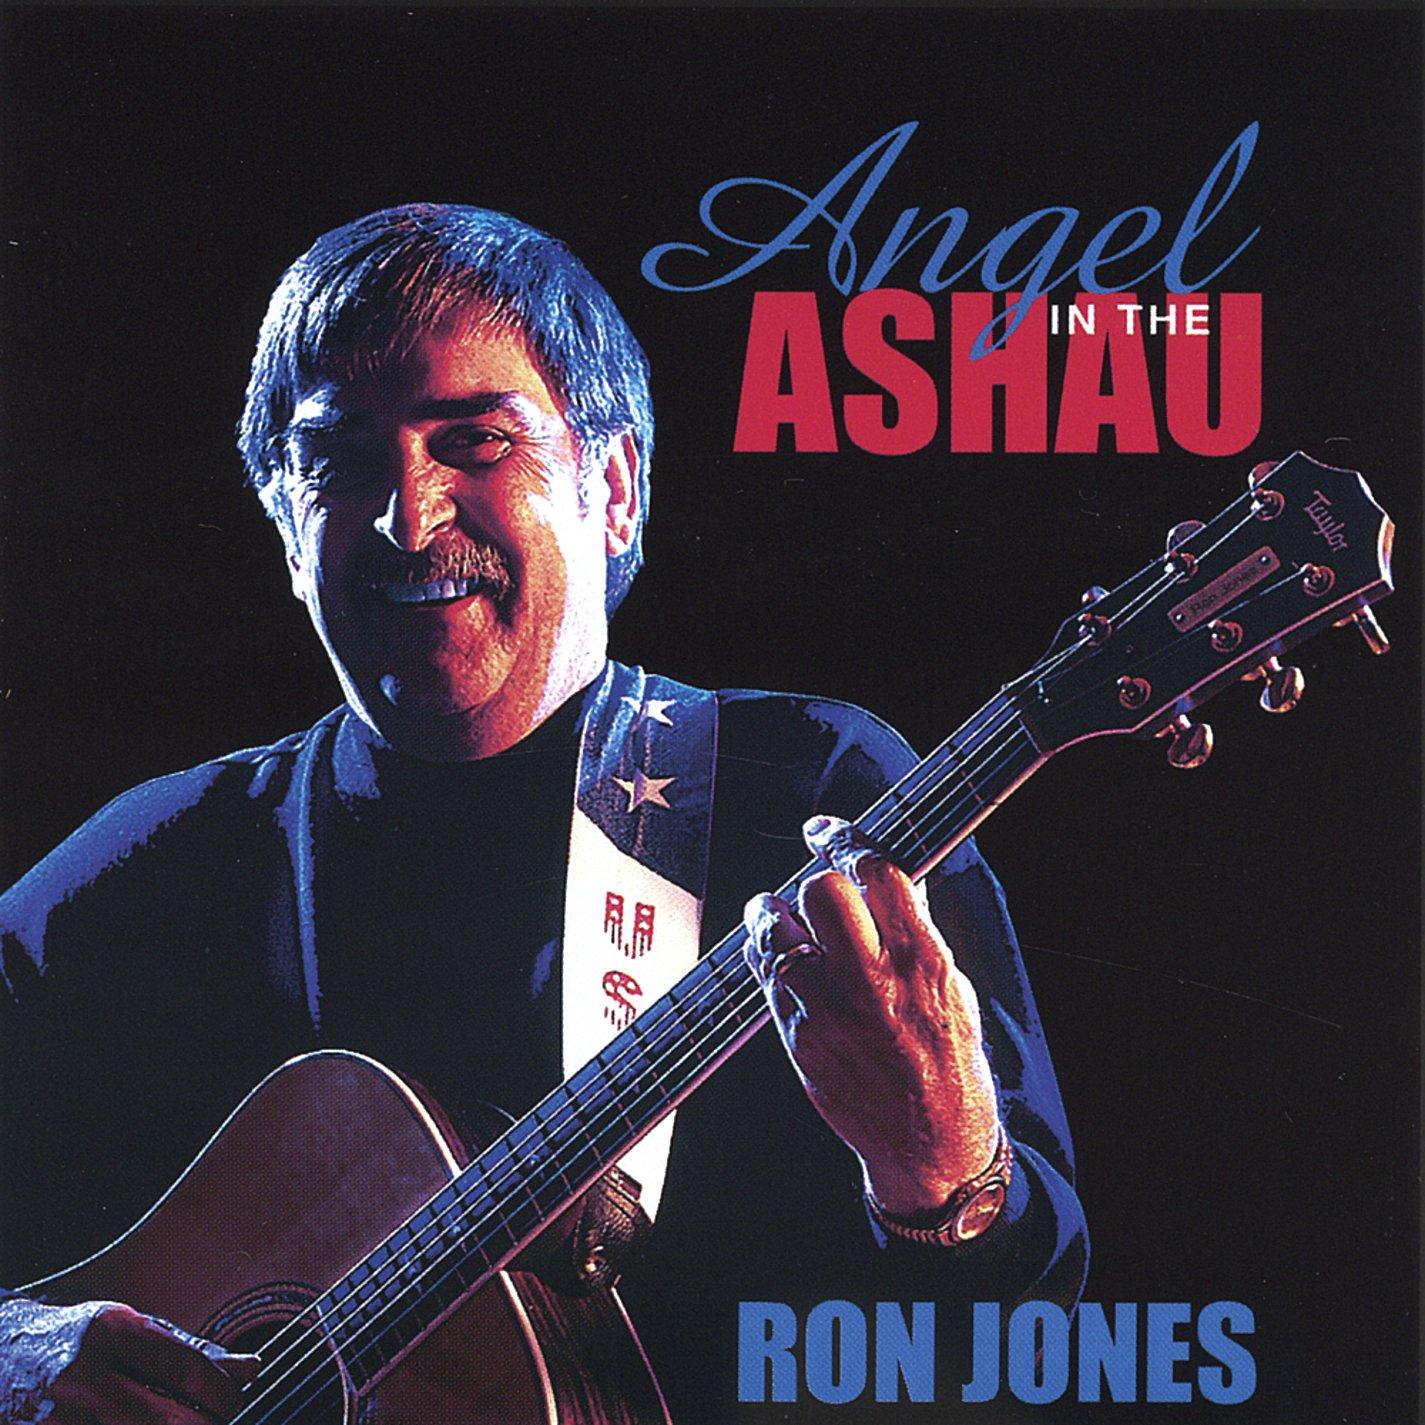 Angel in the Ashau: Ron Jones: Amazon.es: Música